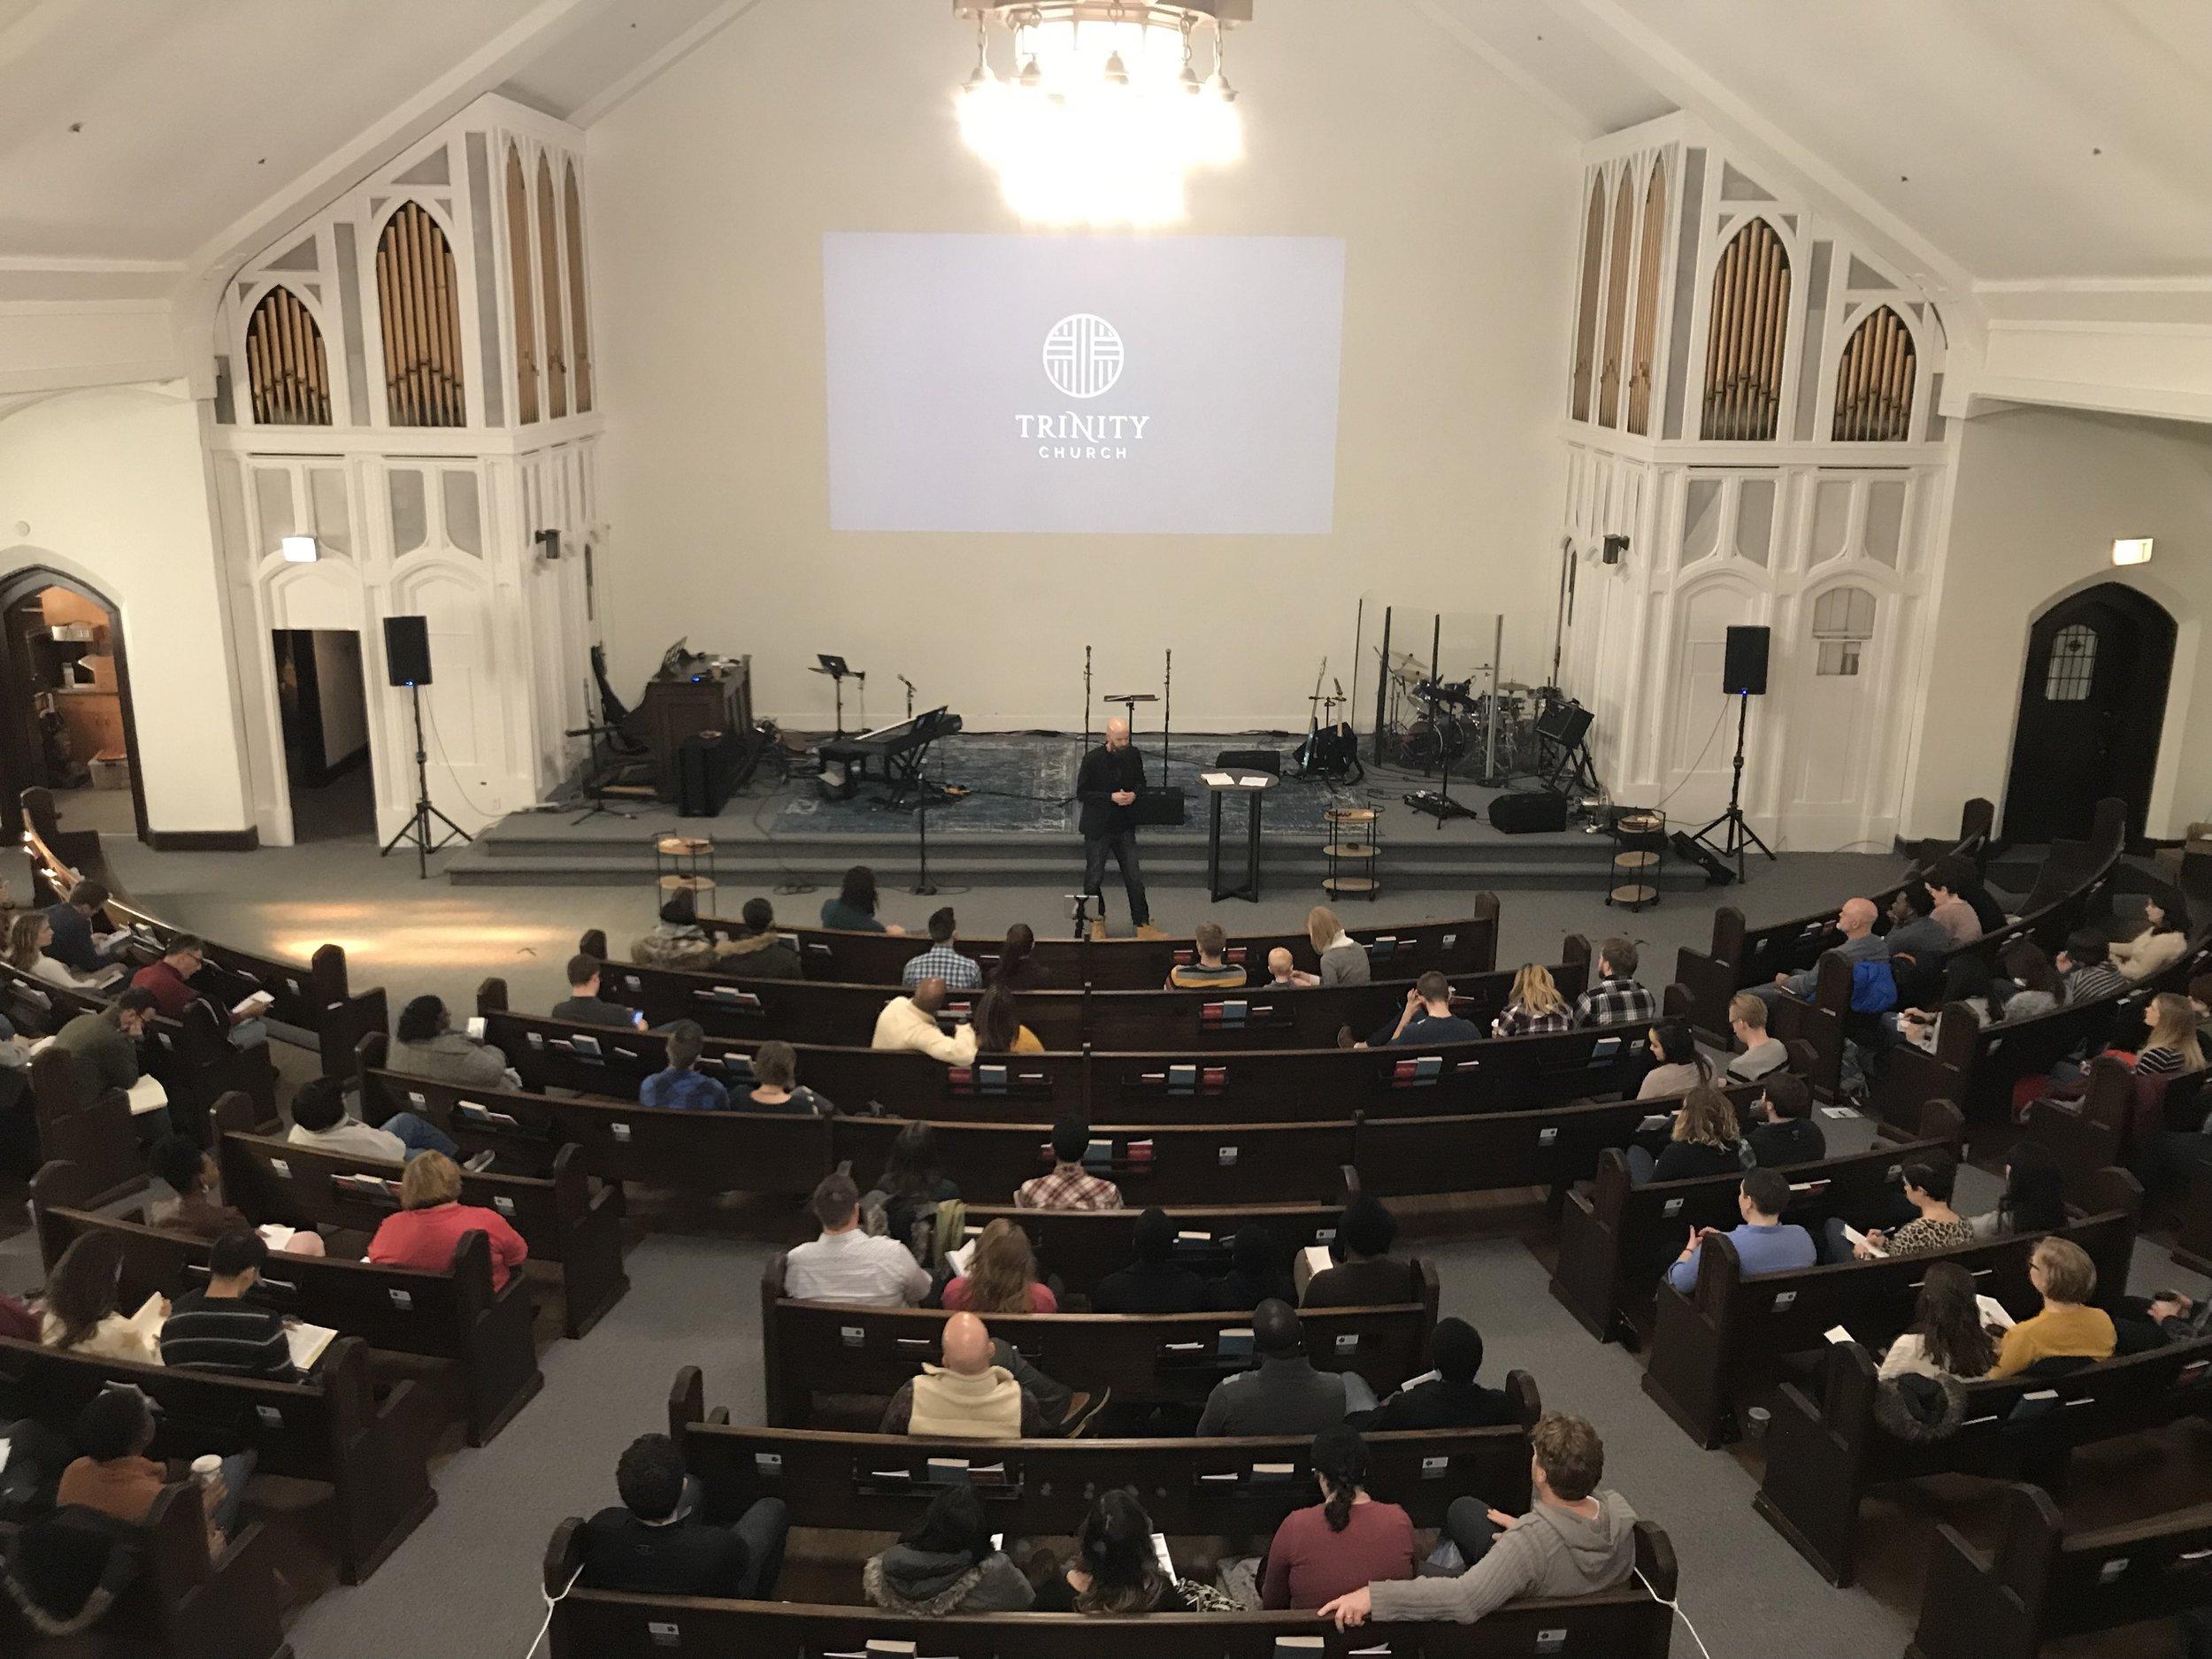 A Sunday morning meeting at Trinity Church